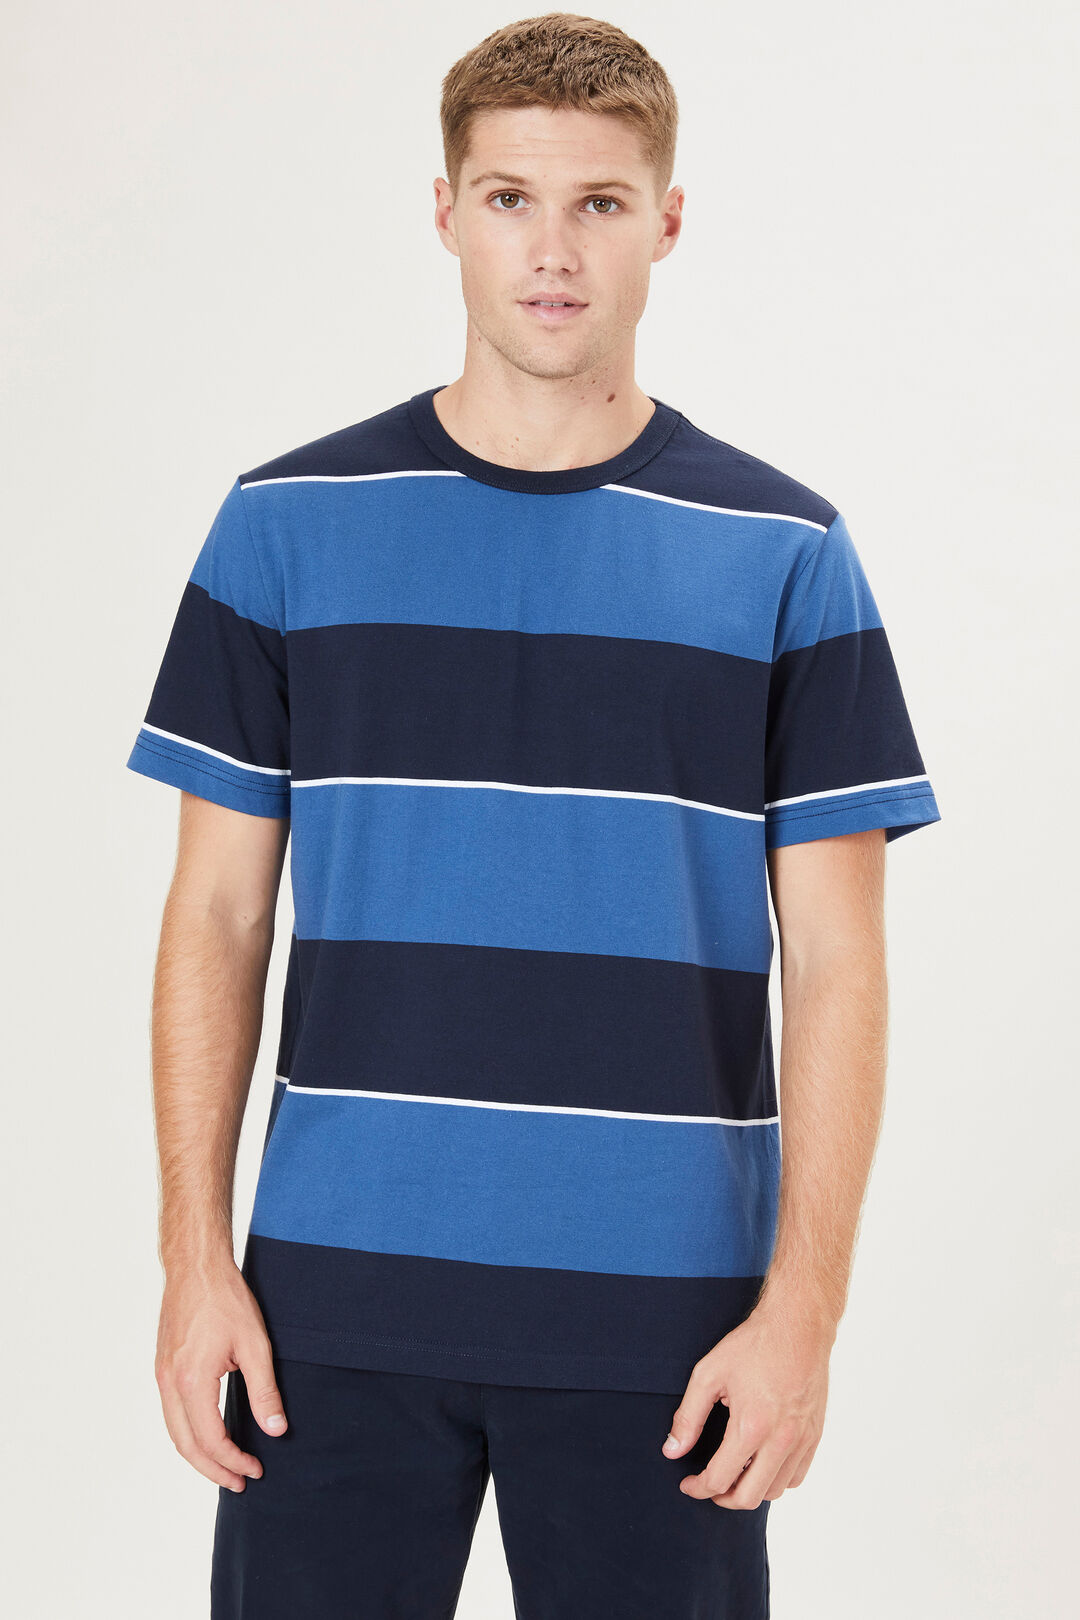 BLOCK STRIPE T-SHIRT  VINTAGE BLUE/NAVY  hi-res